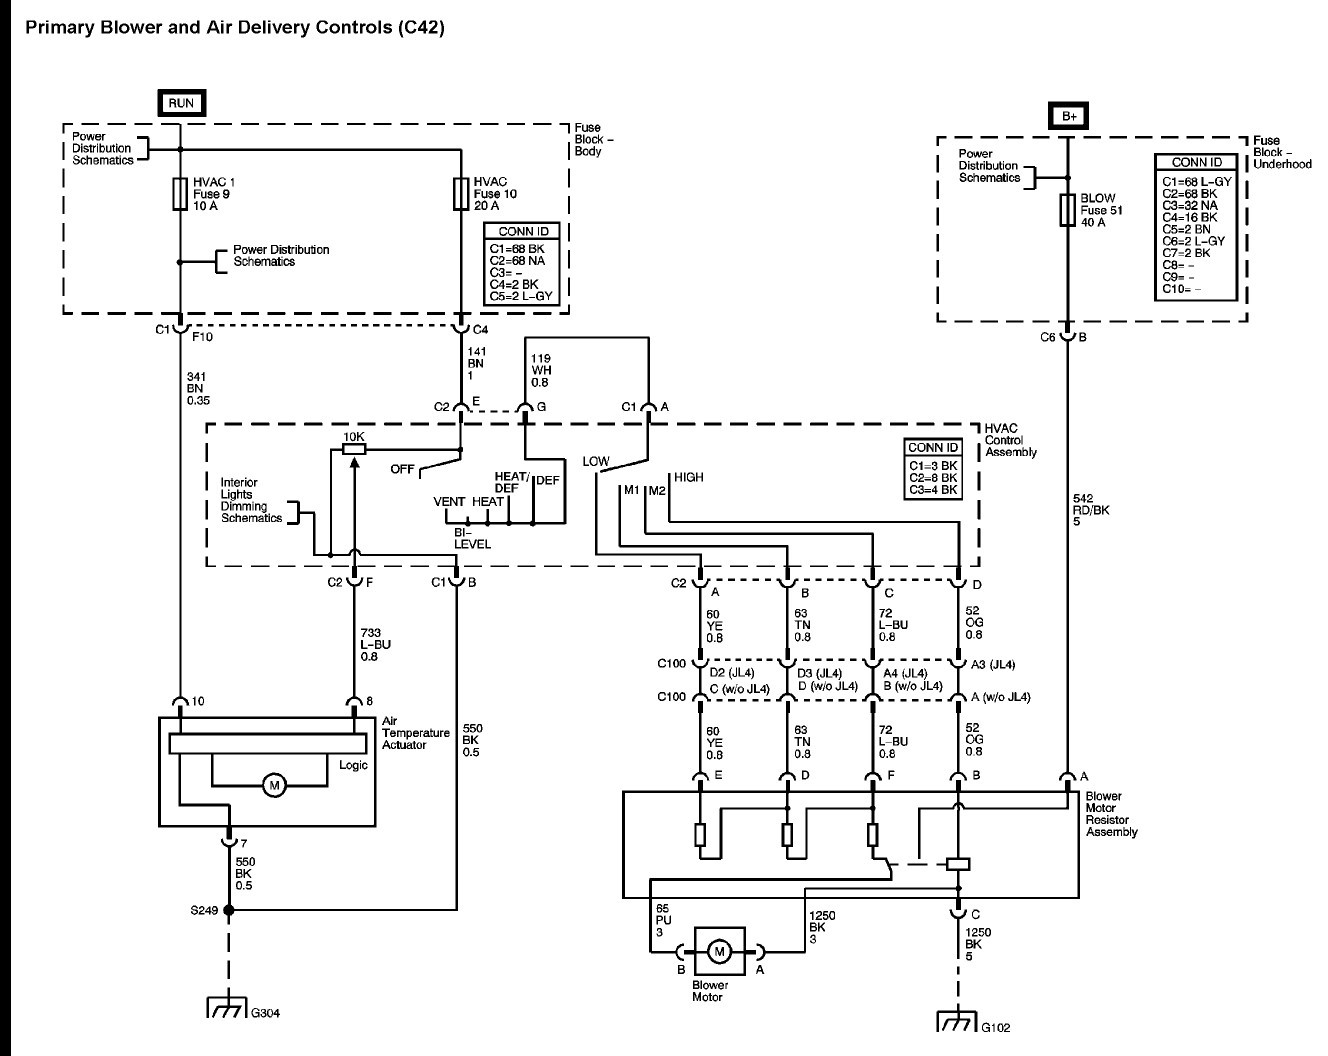 chevy express 2500 wiring diagram detailed schematic diagrams rh redrabbit studios com 2009 GMC Van Wiring Diagram Stereo 2004 chevy express van wiring diagram